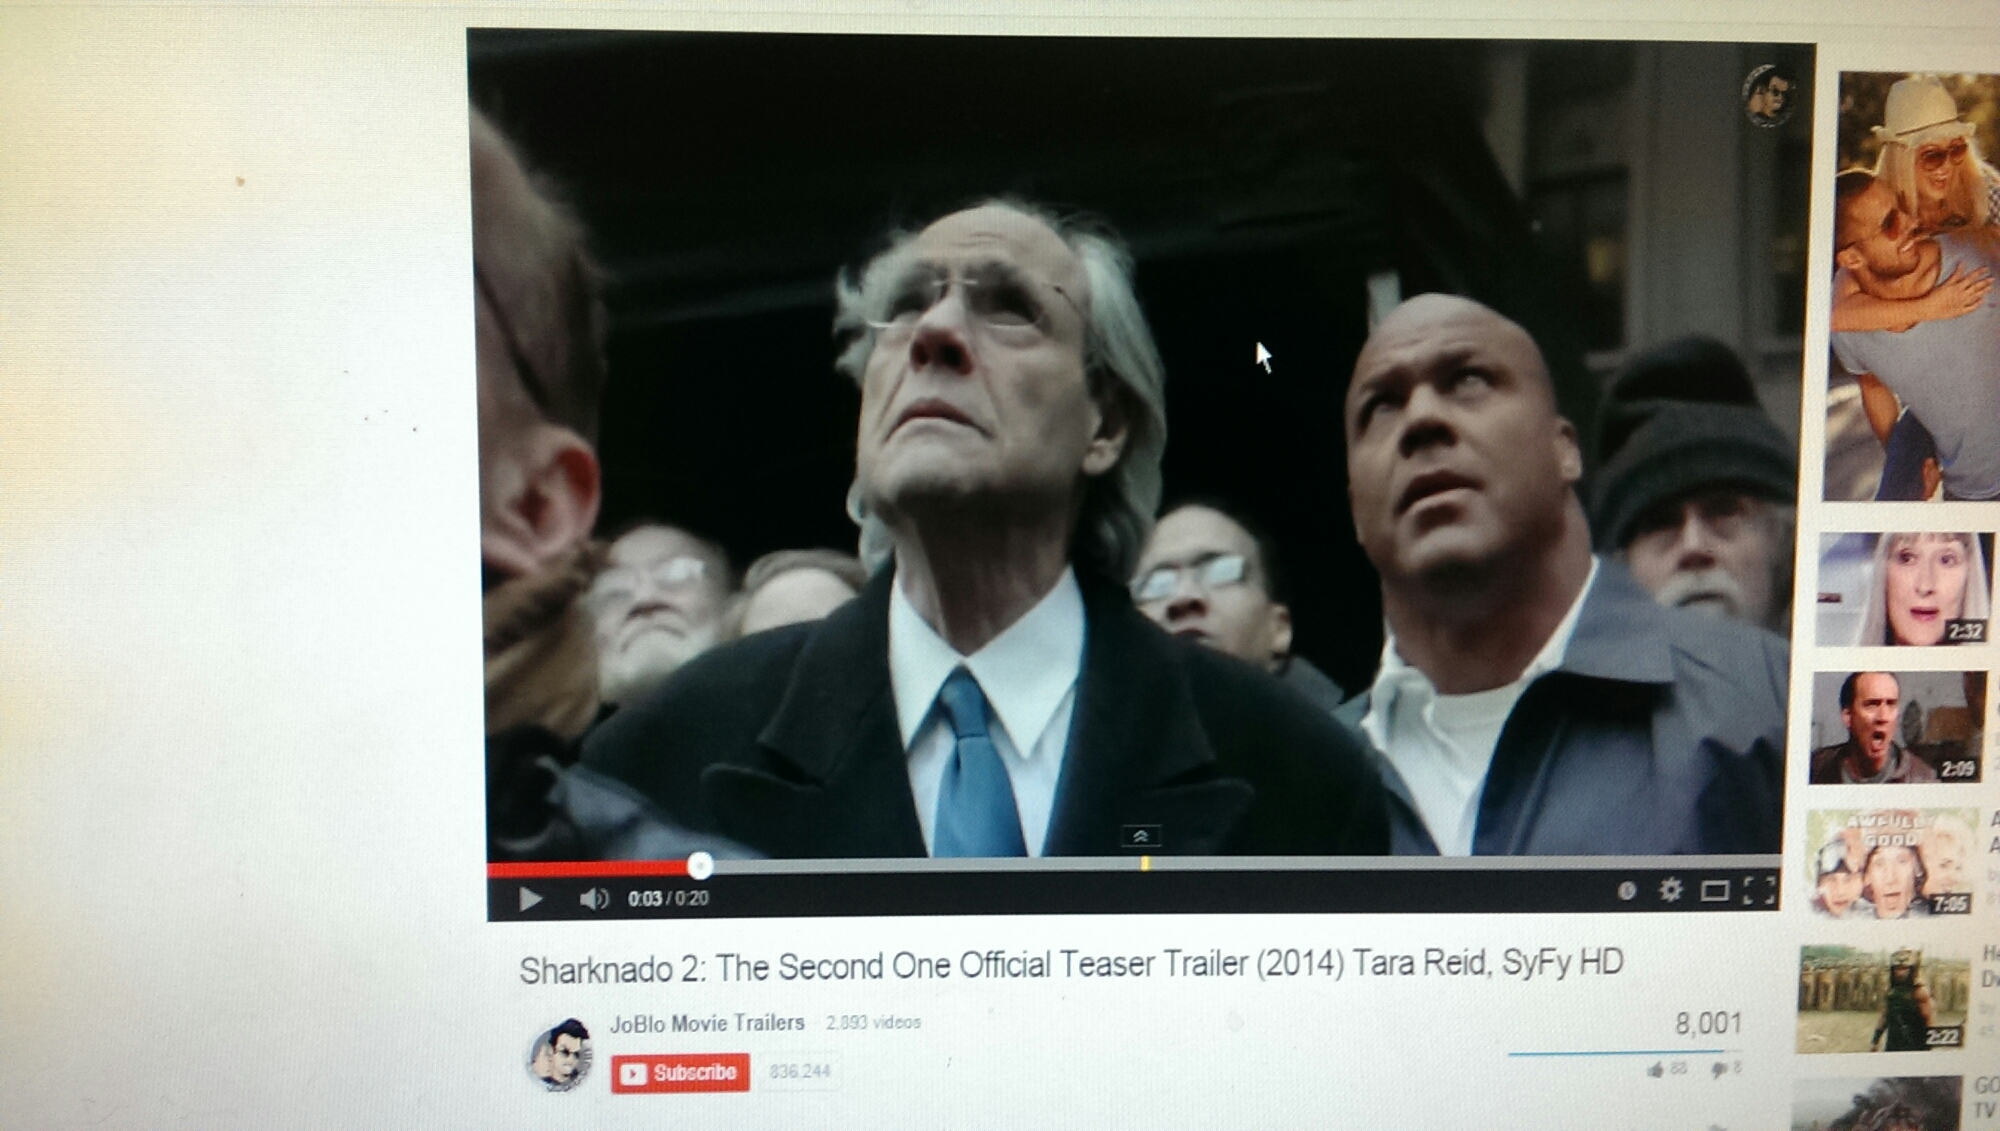 The Sharknado 2 Teaser Trailer - 1230.7KB